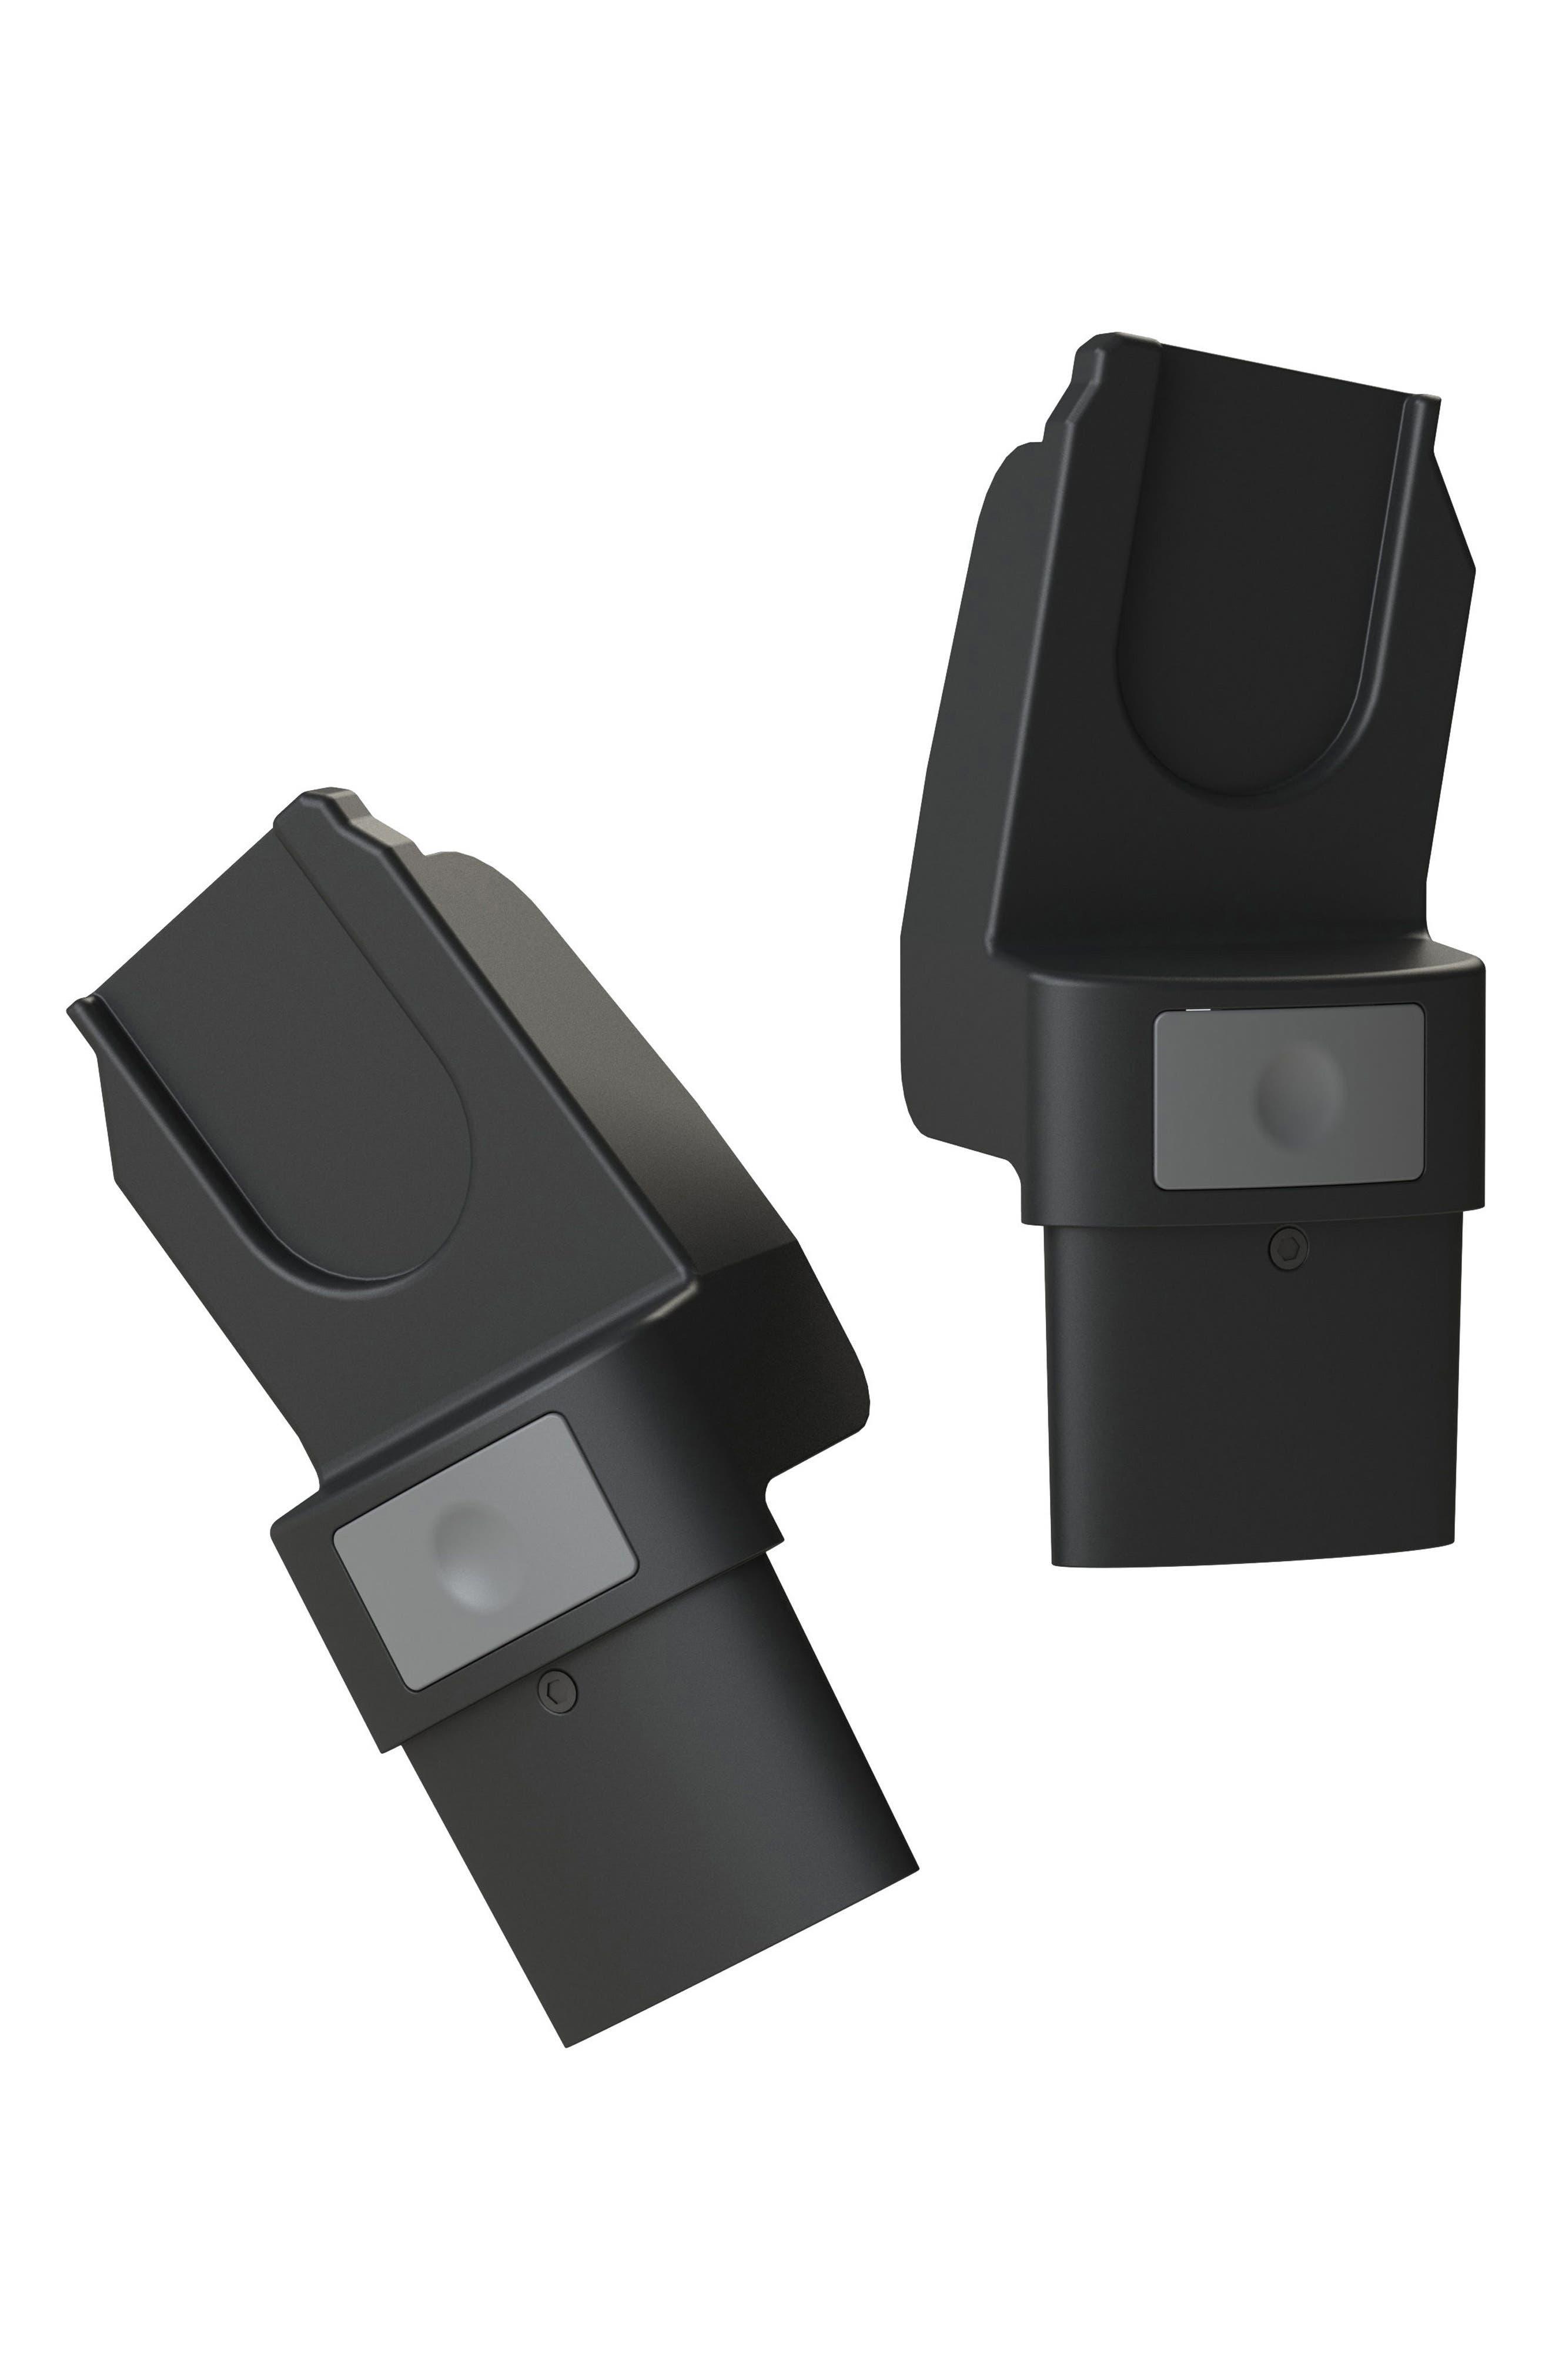 Main Image - Joolz Geo2 Stroller Upper Car Seat Adapter Set